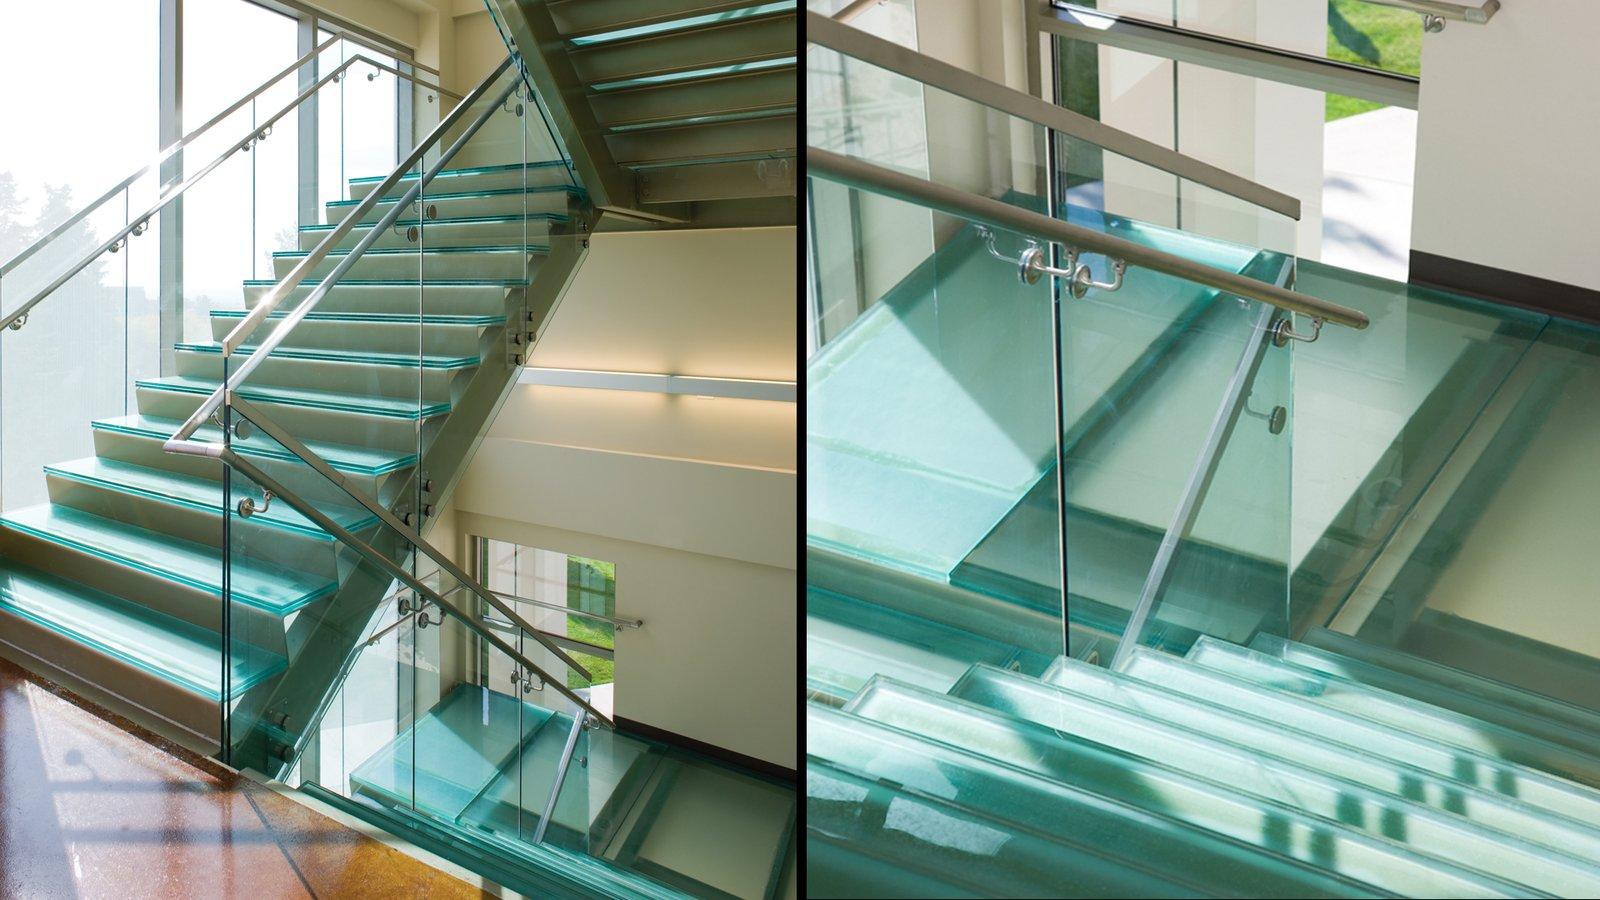 Stair Treads / Flooring, University of Utah, Salt Lake City  Architect/Designer: Cooper Roberts Simonsen Associates Glass Manufacturer: Nathan Allan Glass Studios  View Case Study: http://nathanallan.com/our-portfolio/university-of-utah/  Architectural + Decorative Glass